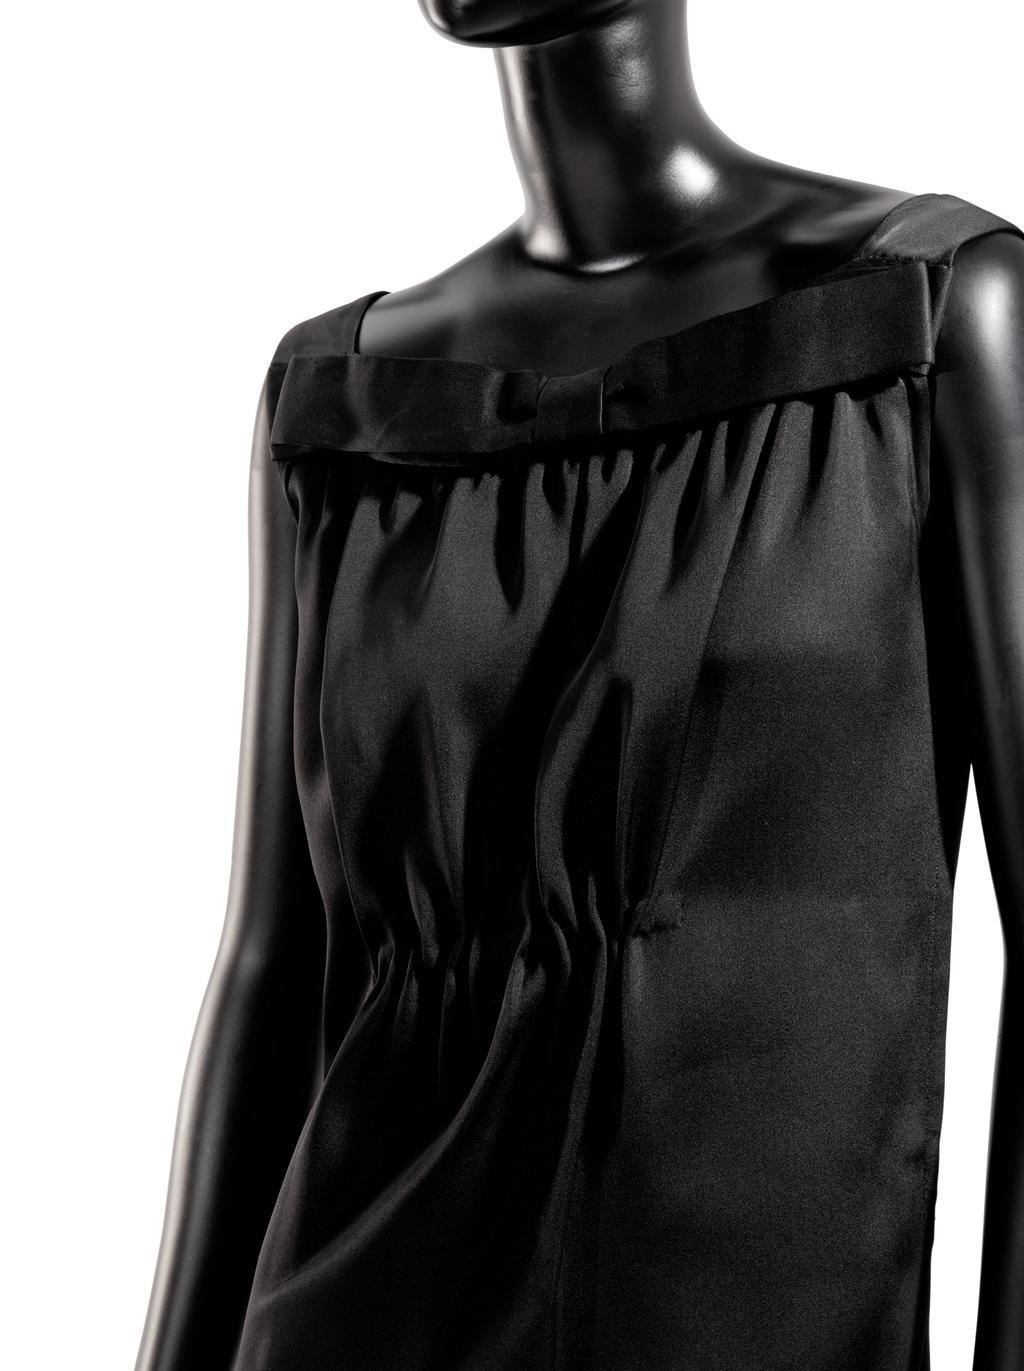 Sothebys_Givenchy_1956_Fashionela